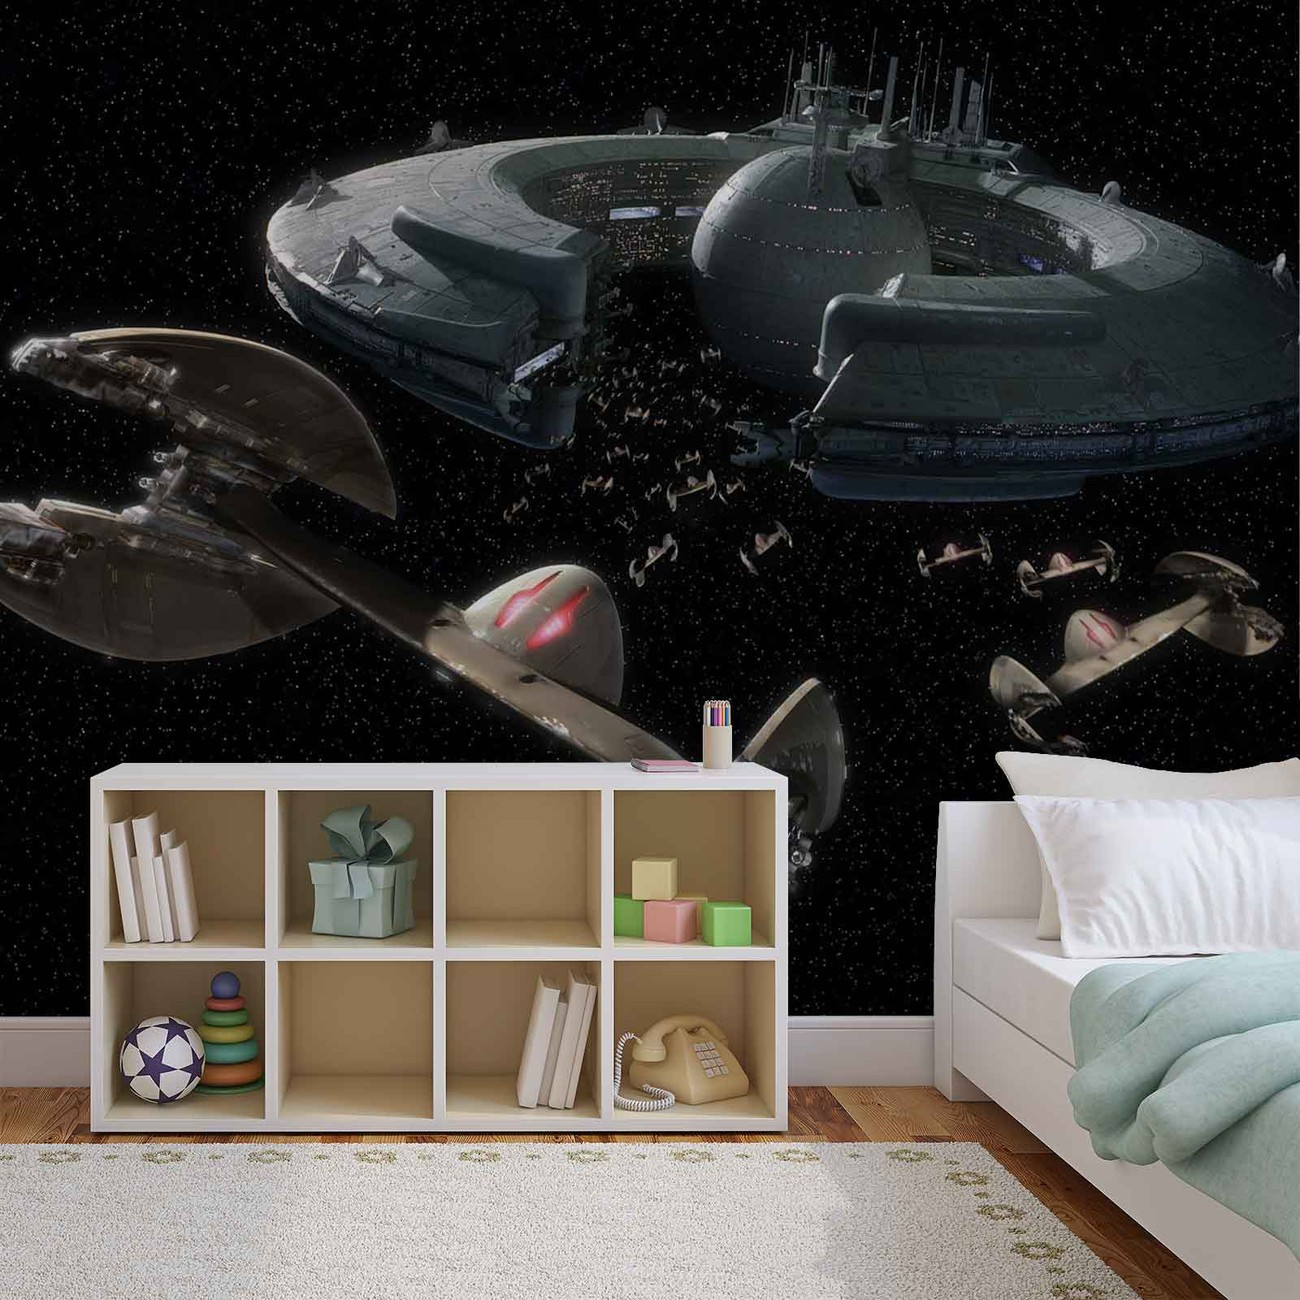 Star Wars Droid Control Ship Lucrehulk Wall Paper Mural Buy At